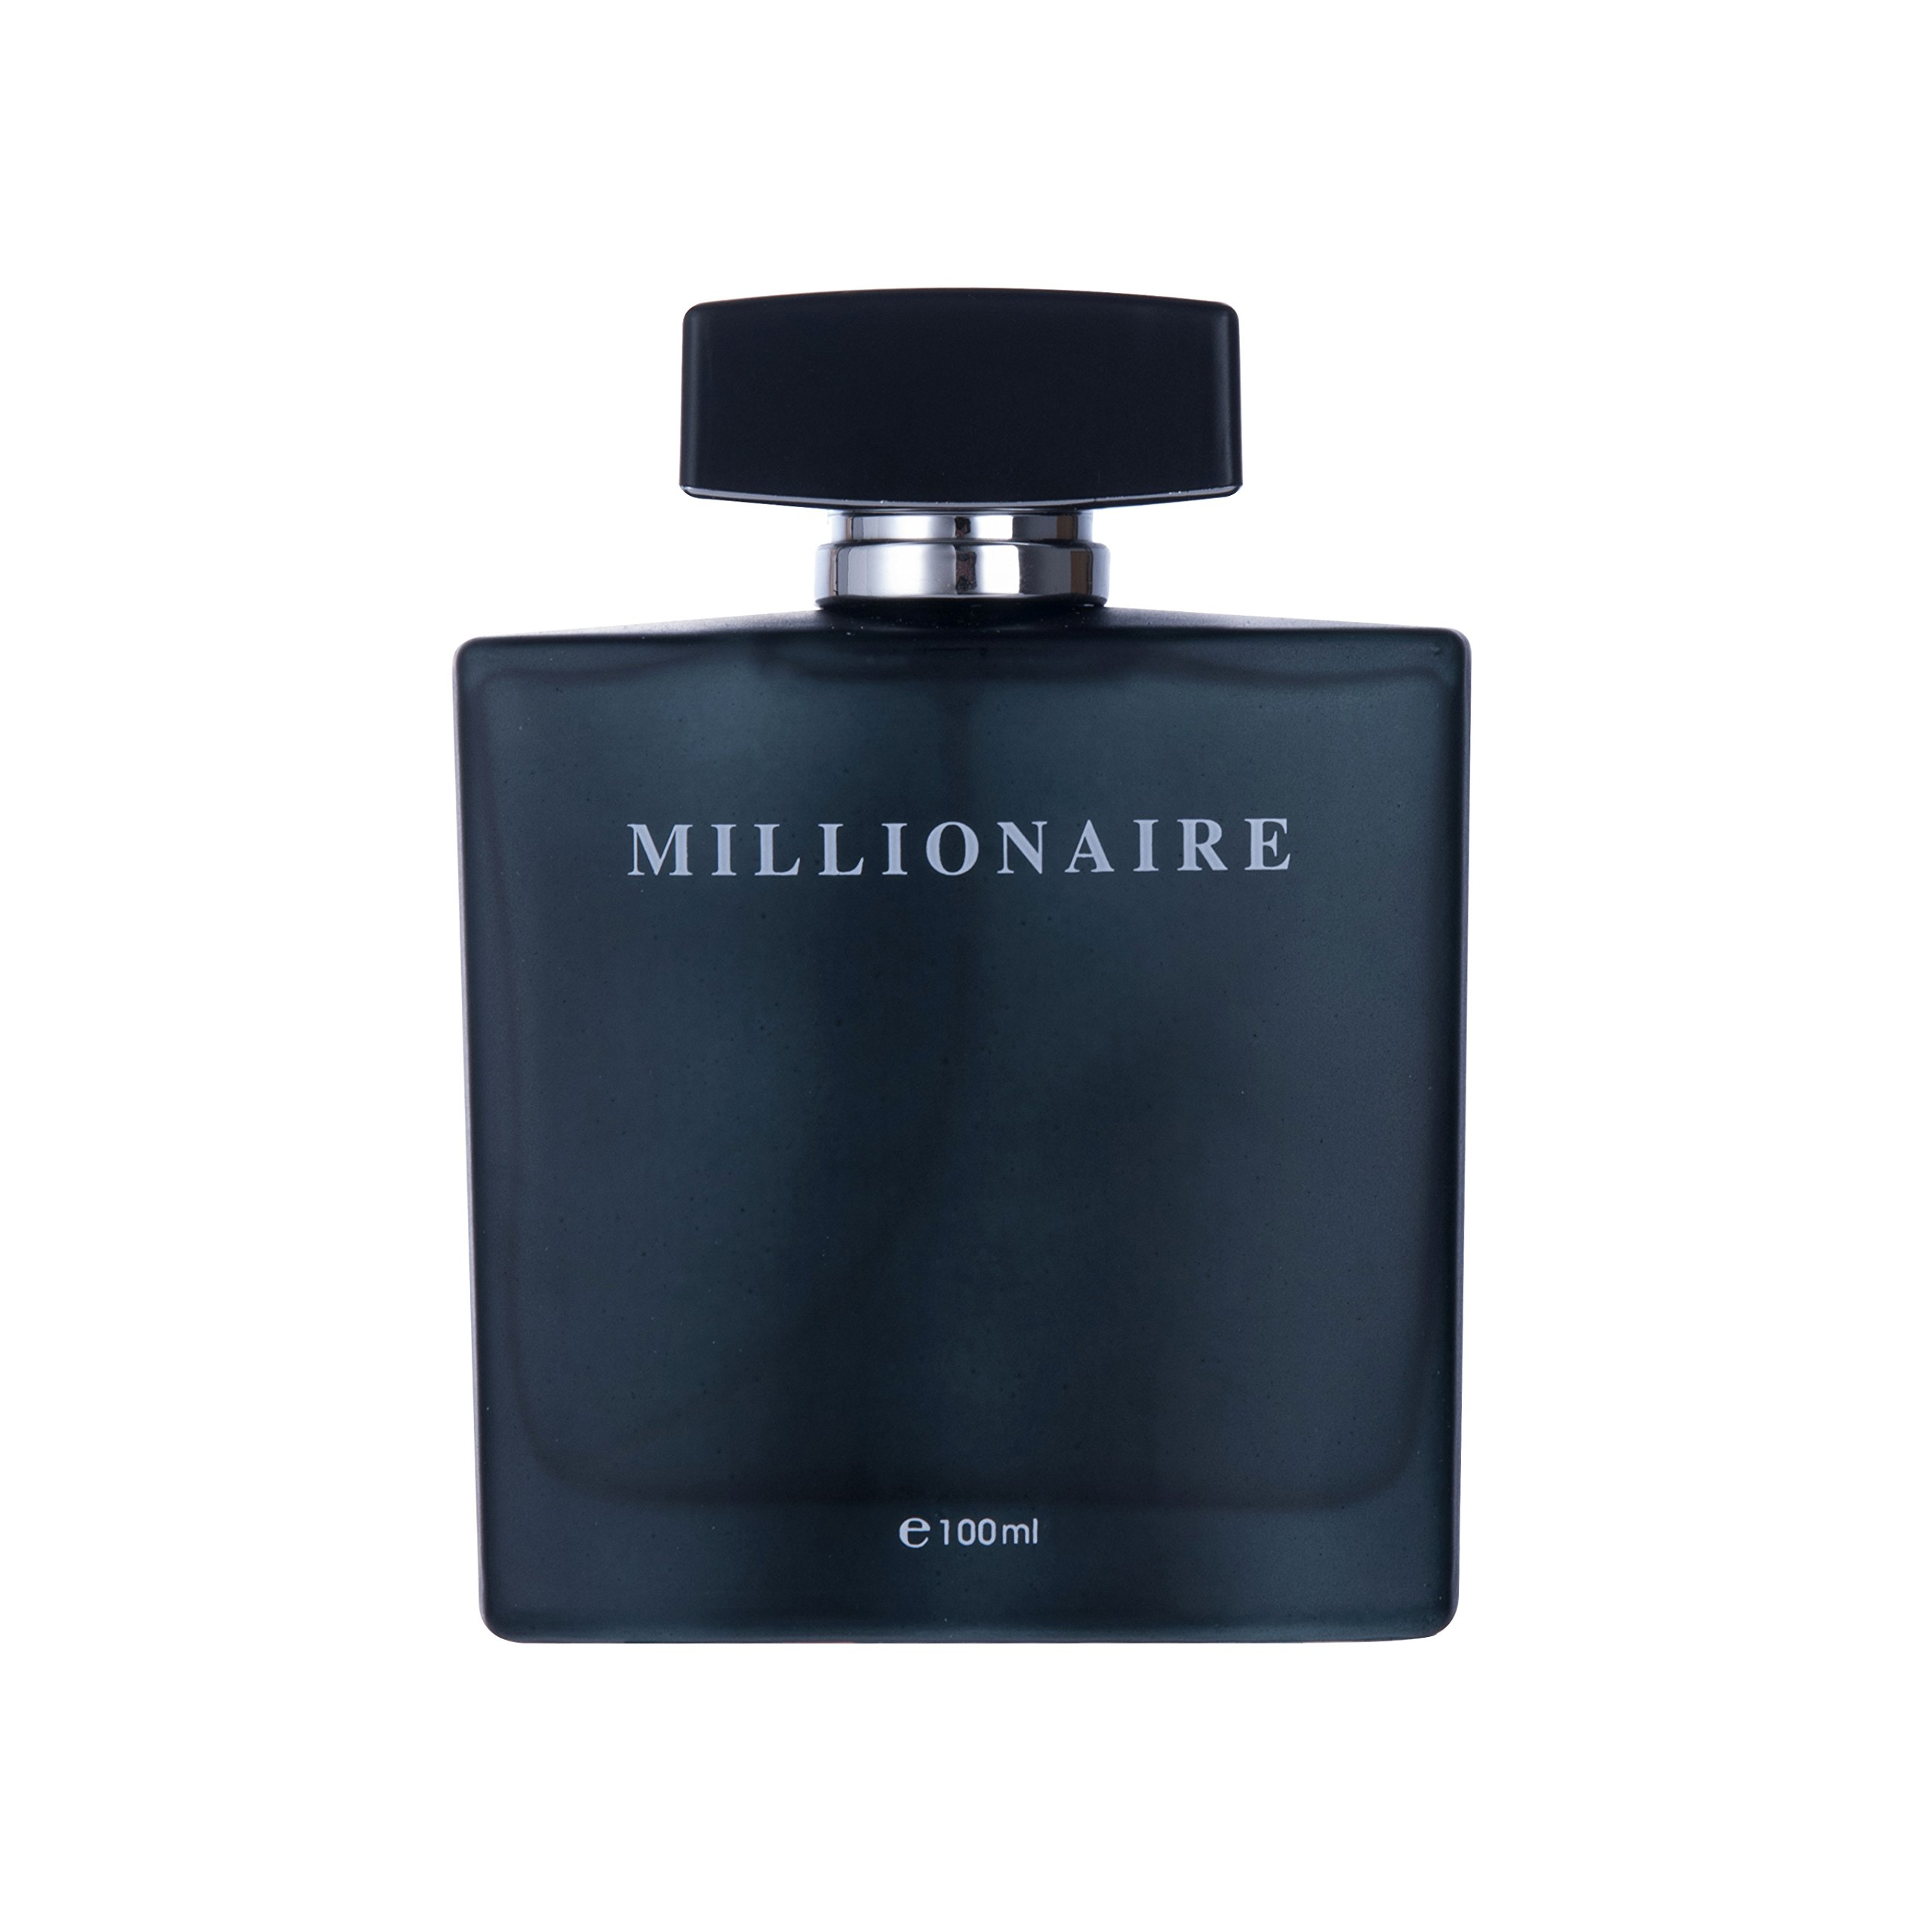 Perfume&Beauty Perfume Eau de Parfume for Men, 3.4 oz Spray Parfume for Men 100 ML- Black Millionaire by PERFUME&BEAUTY